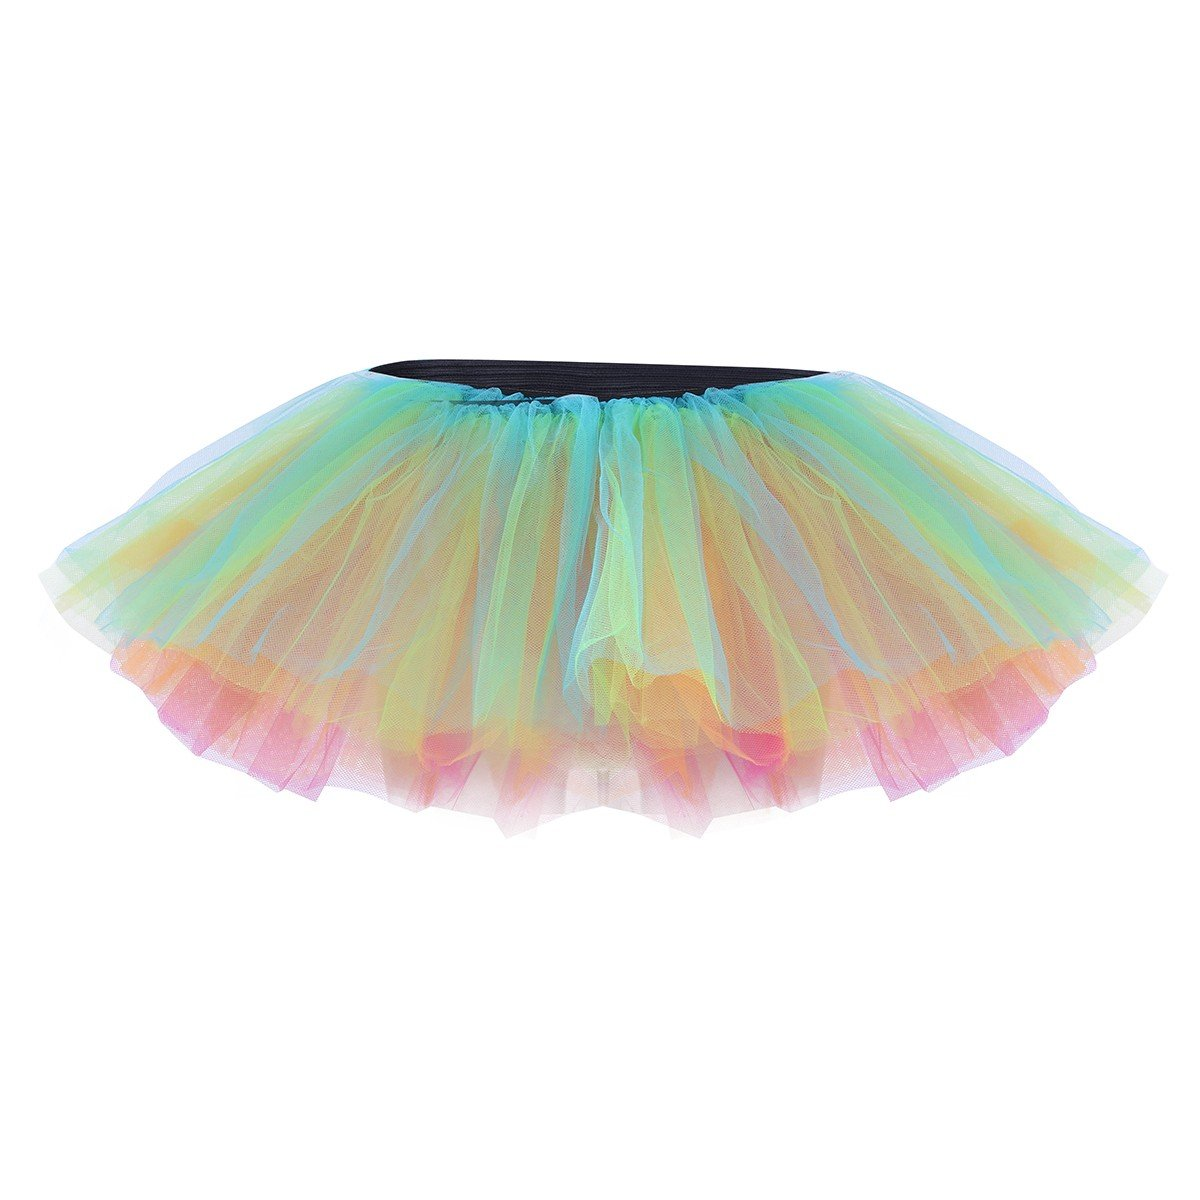 981c07c18e780 TiaoBug Tutu Ballet Robe Femme Adulte Tulle 5 Couches Déguisement Costume  Femme Tutu Danse Cosplay Femme Mini Jupe